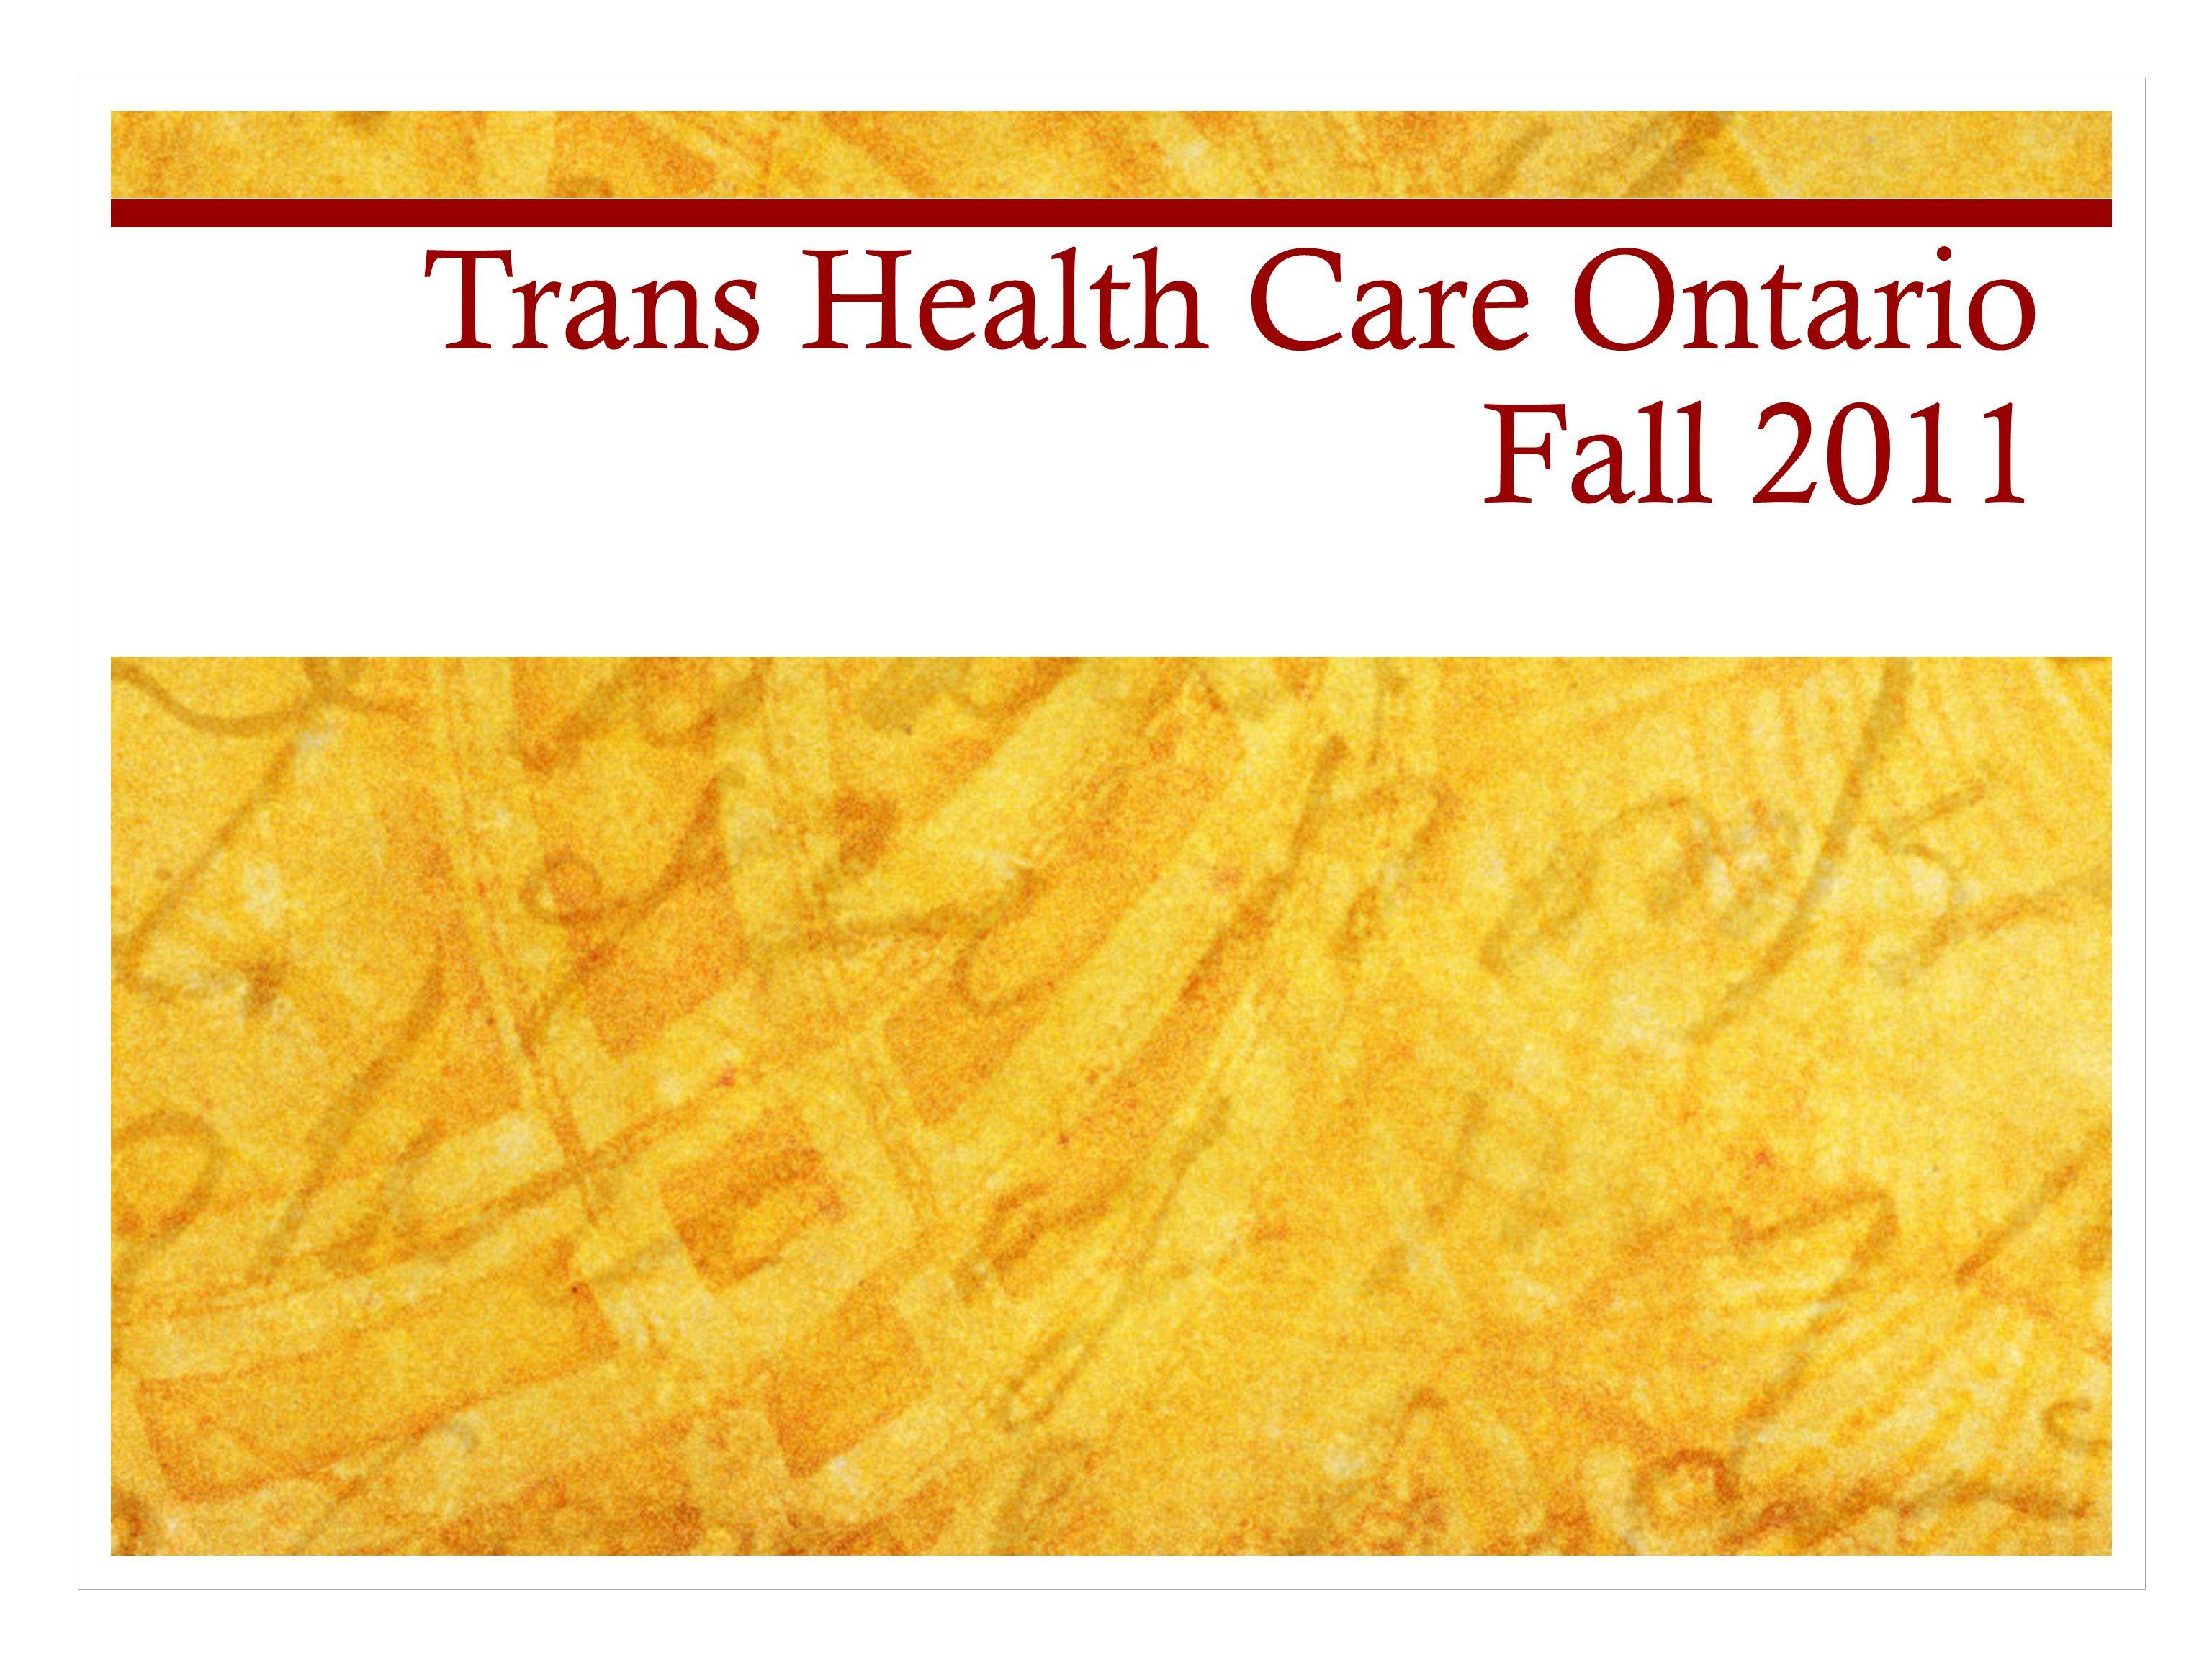 Trans Health Care Ontario Fall 2011